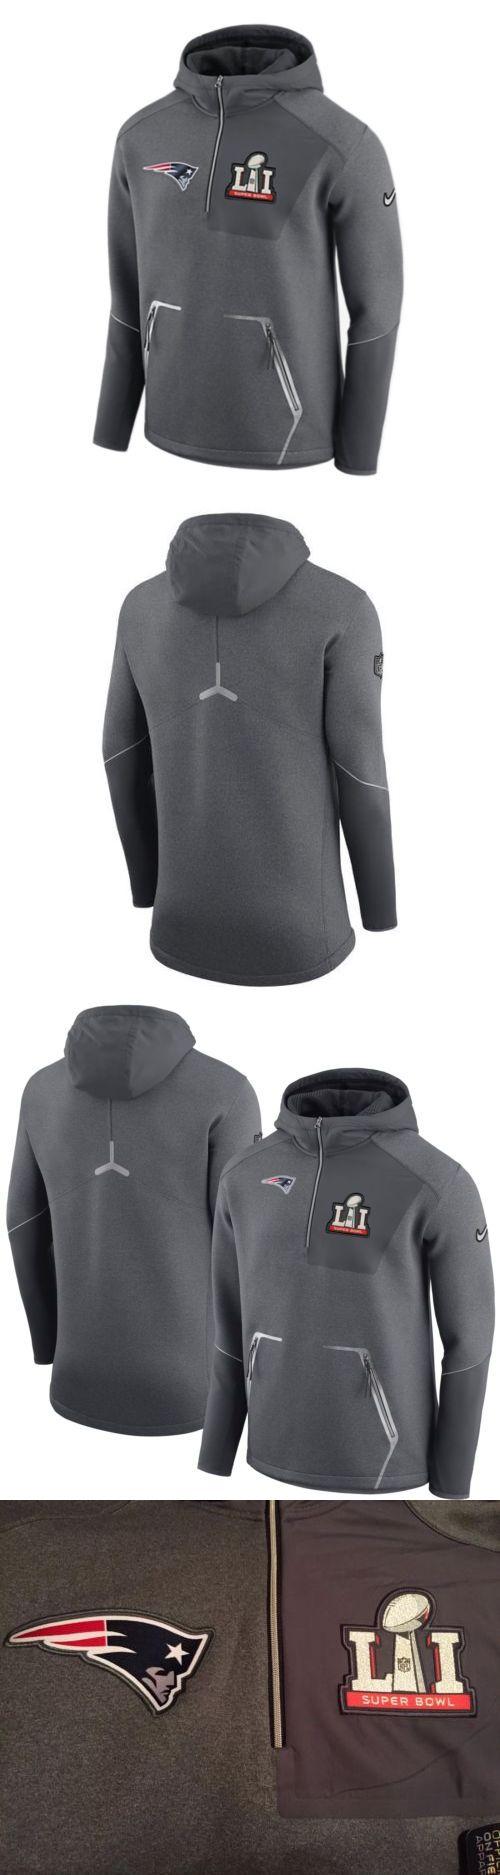 Football-NFL 206: Nike New England Patriots Super Bowl Li Media Day Jacket Hoodie (Men S Large) -> BUY IT NOW ONLY: $130 on eBay!